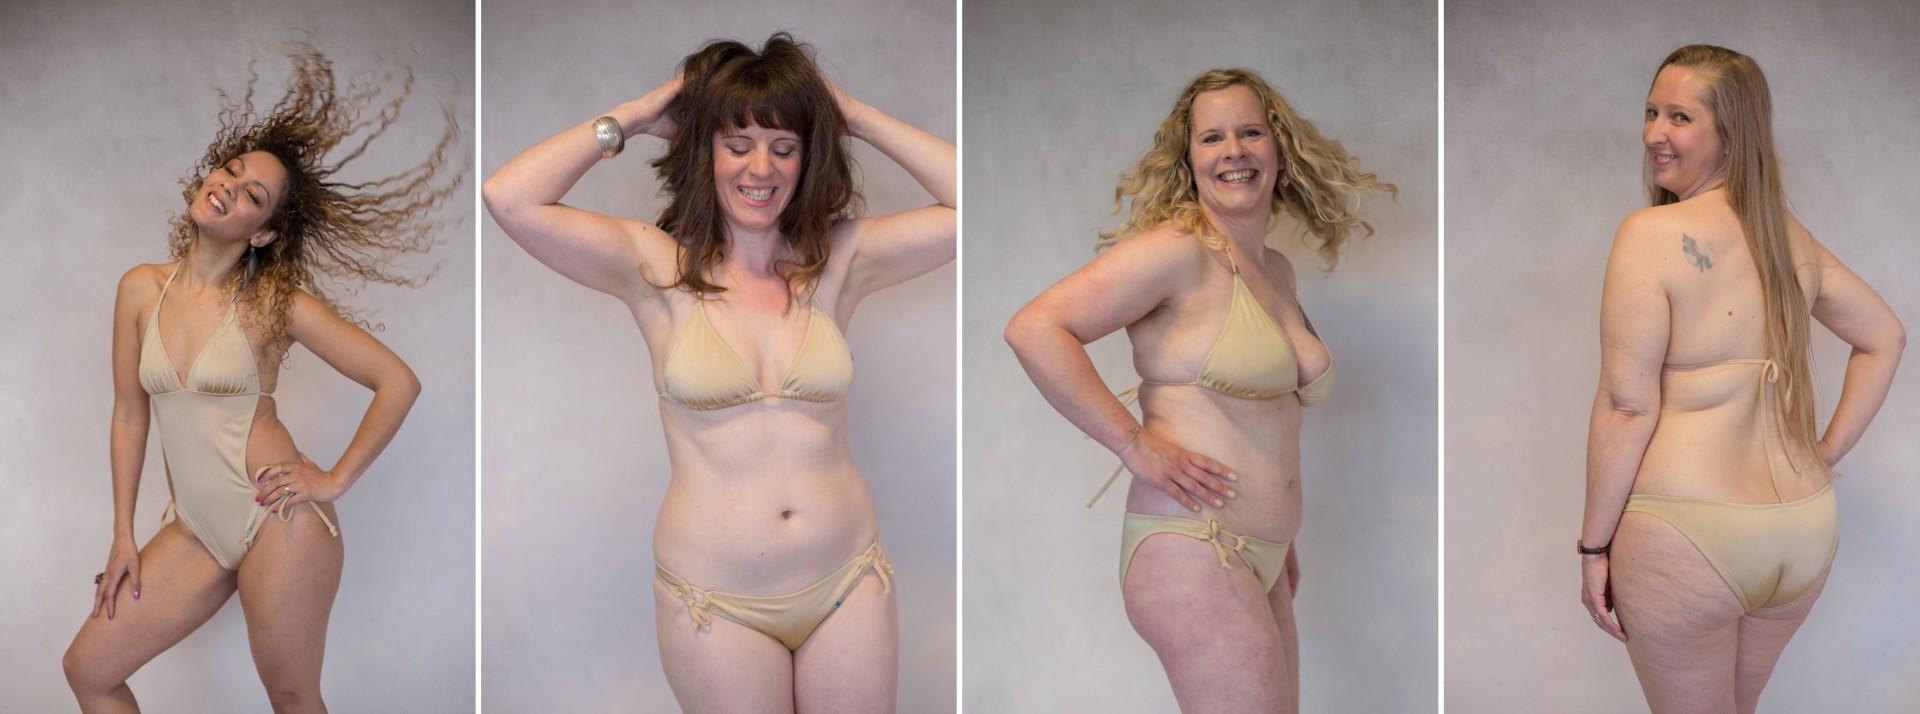 body positive bikini photoshoot by Viktoria Kuti Photography, Bristol UK